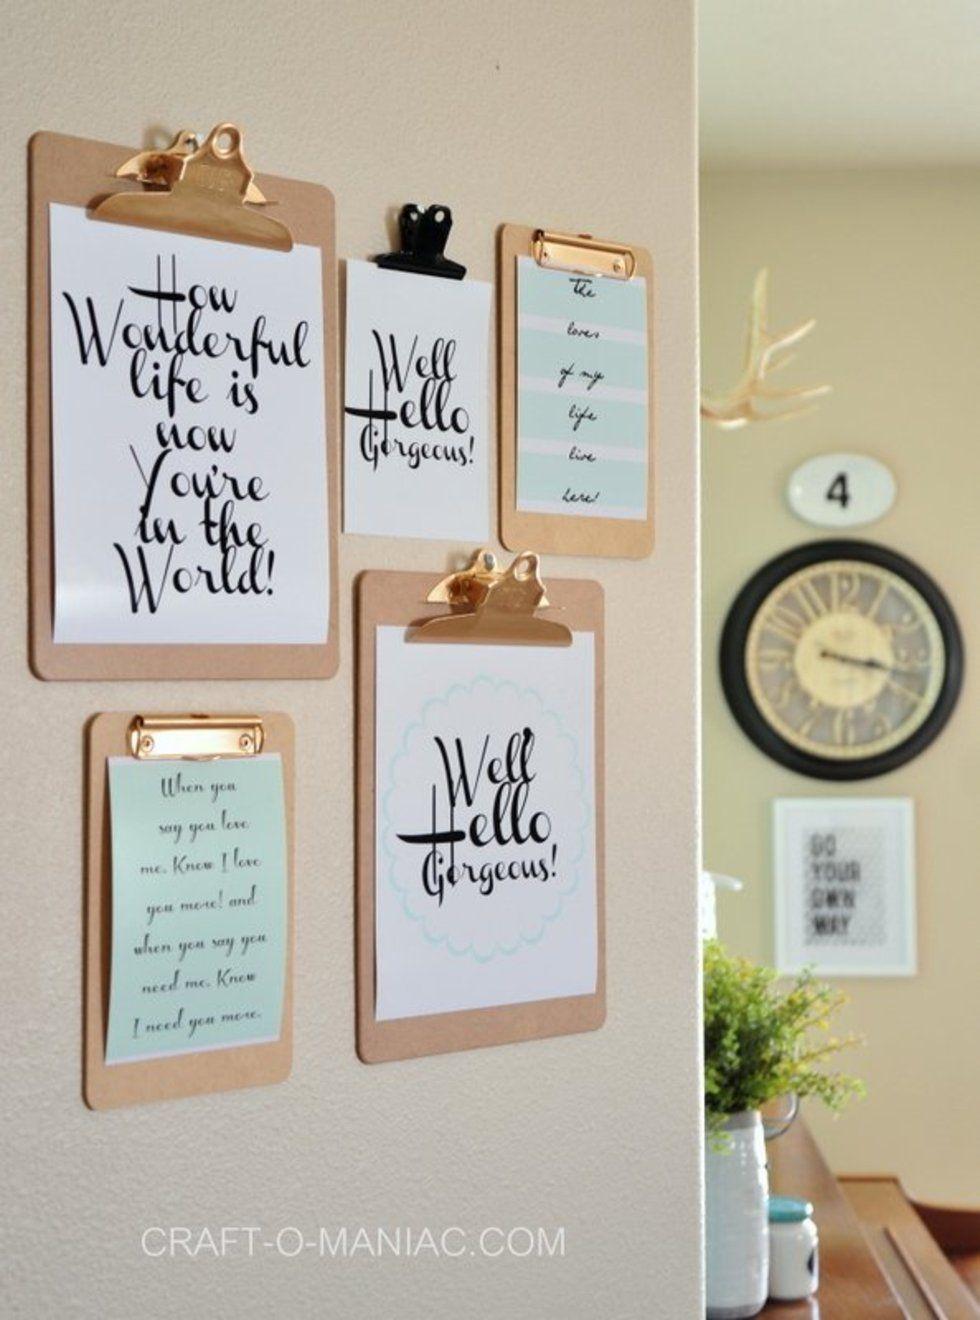 Words on bedroom walls tumblr - Bedroom Pin Clipboards Instead Of Posters